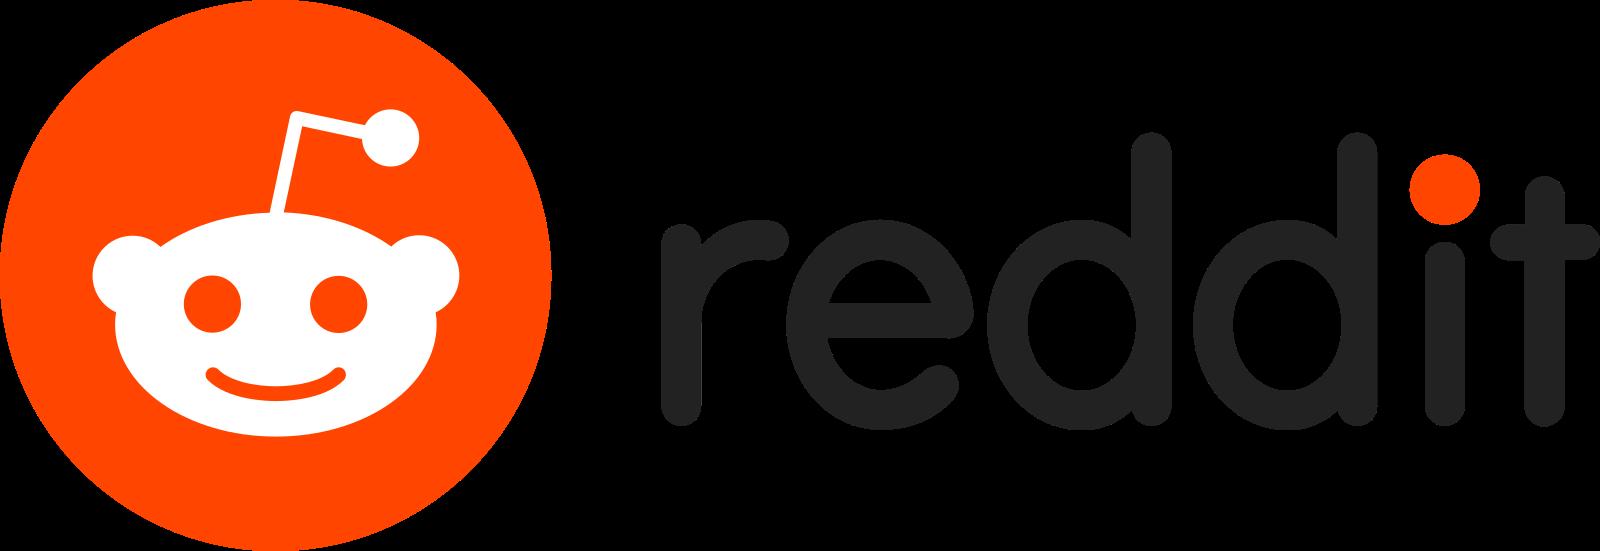 reddit logo 4 - Reddit Logo